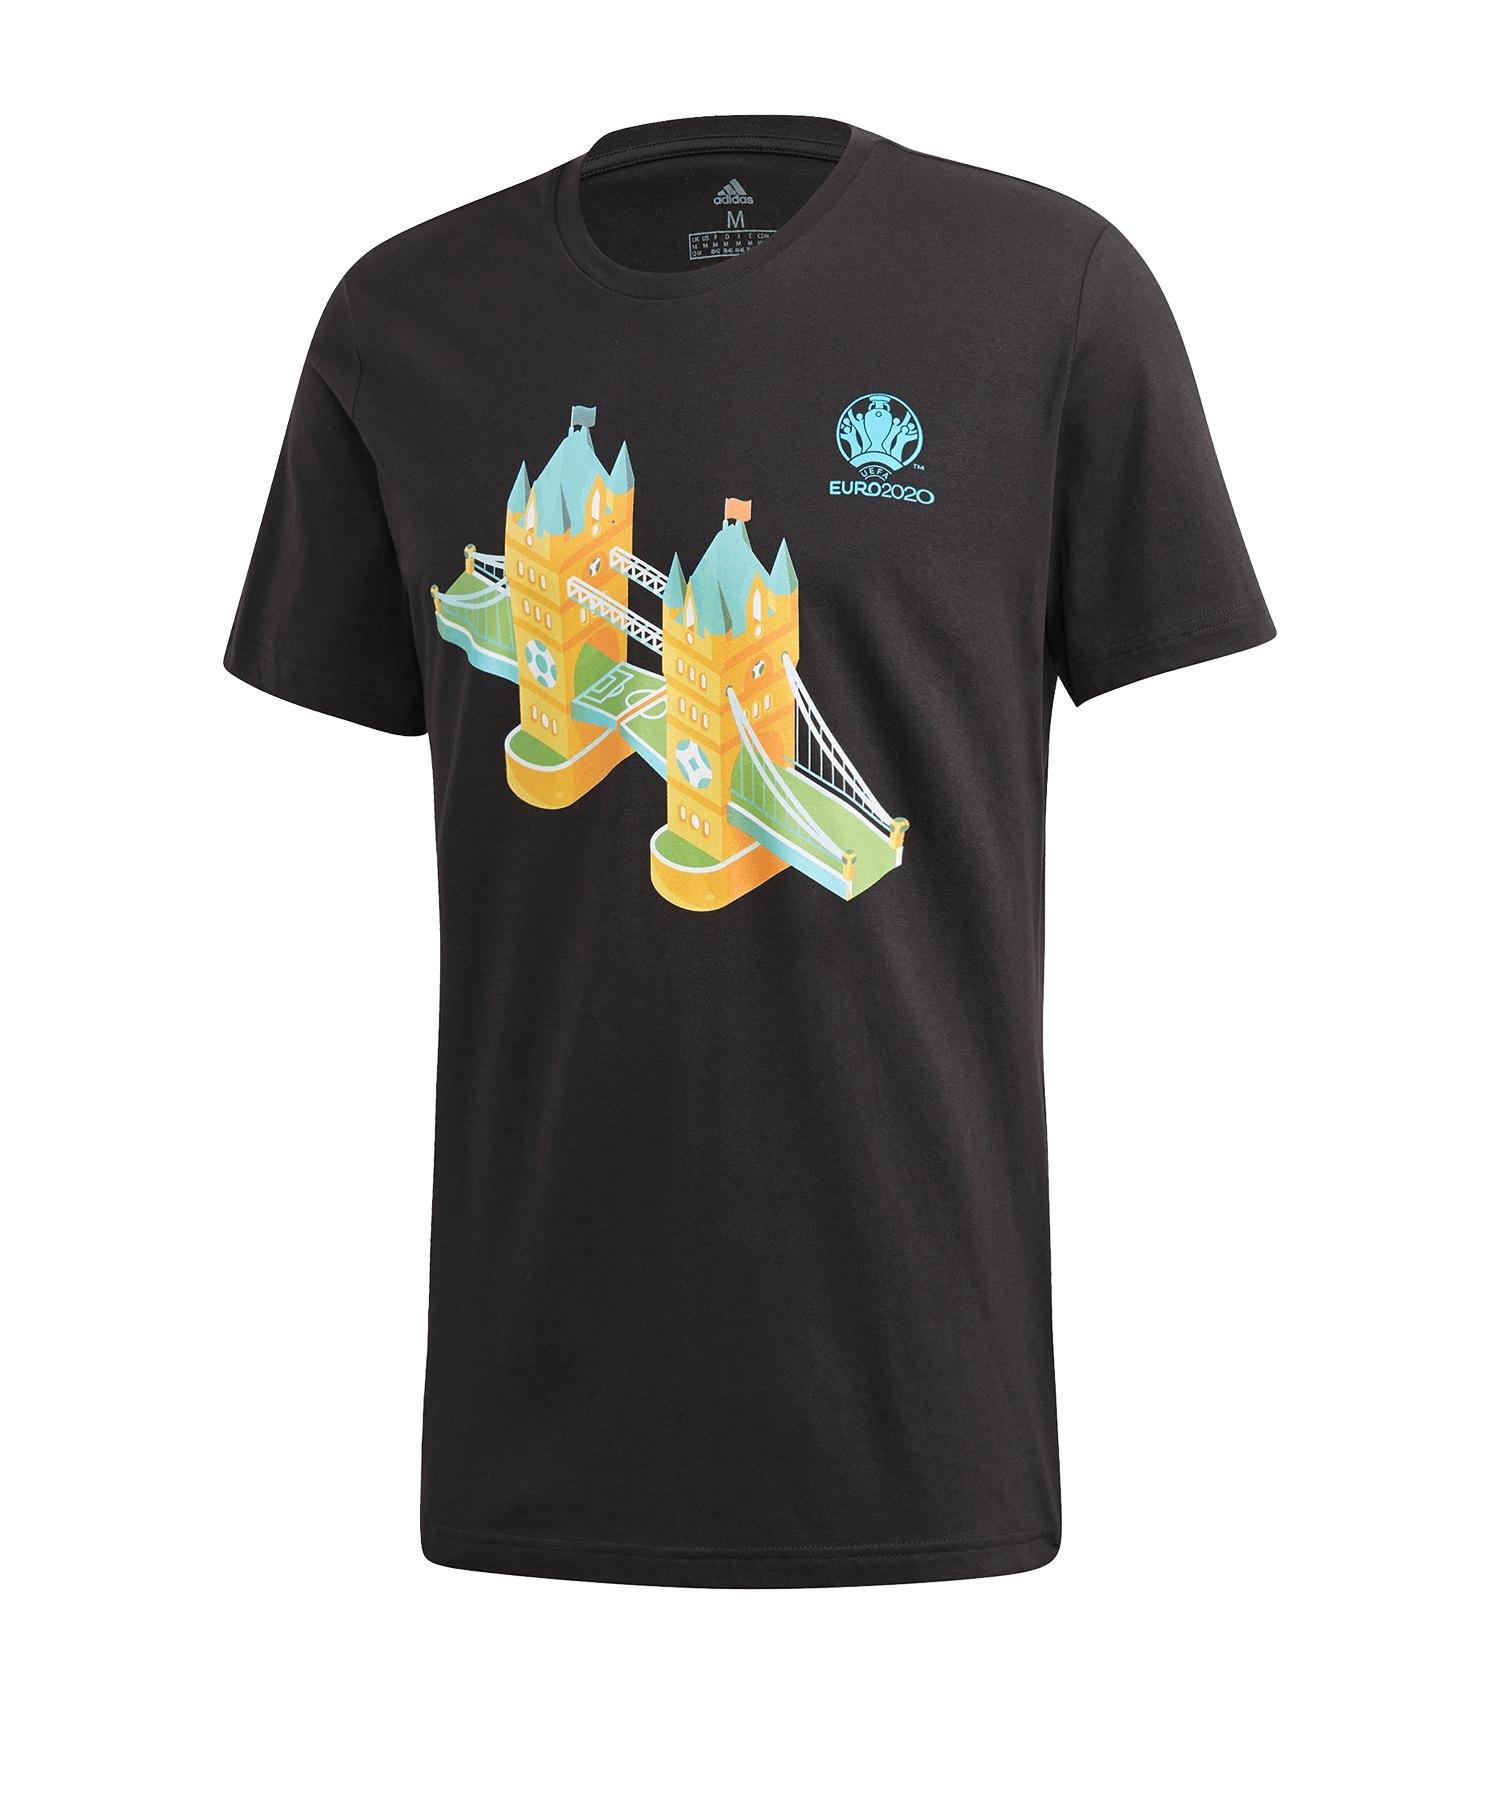 adidas EM 2020 Road to Wembley T-Shirt Schwarz - schwarz